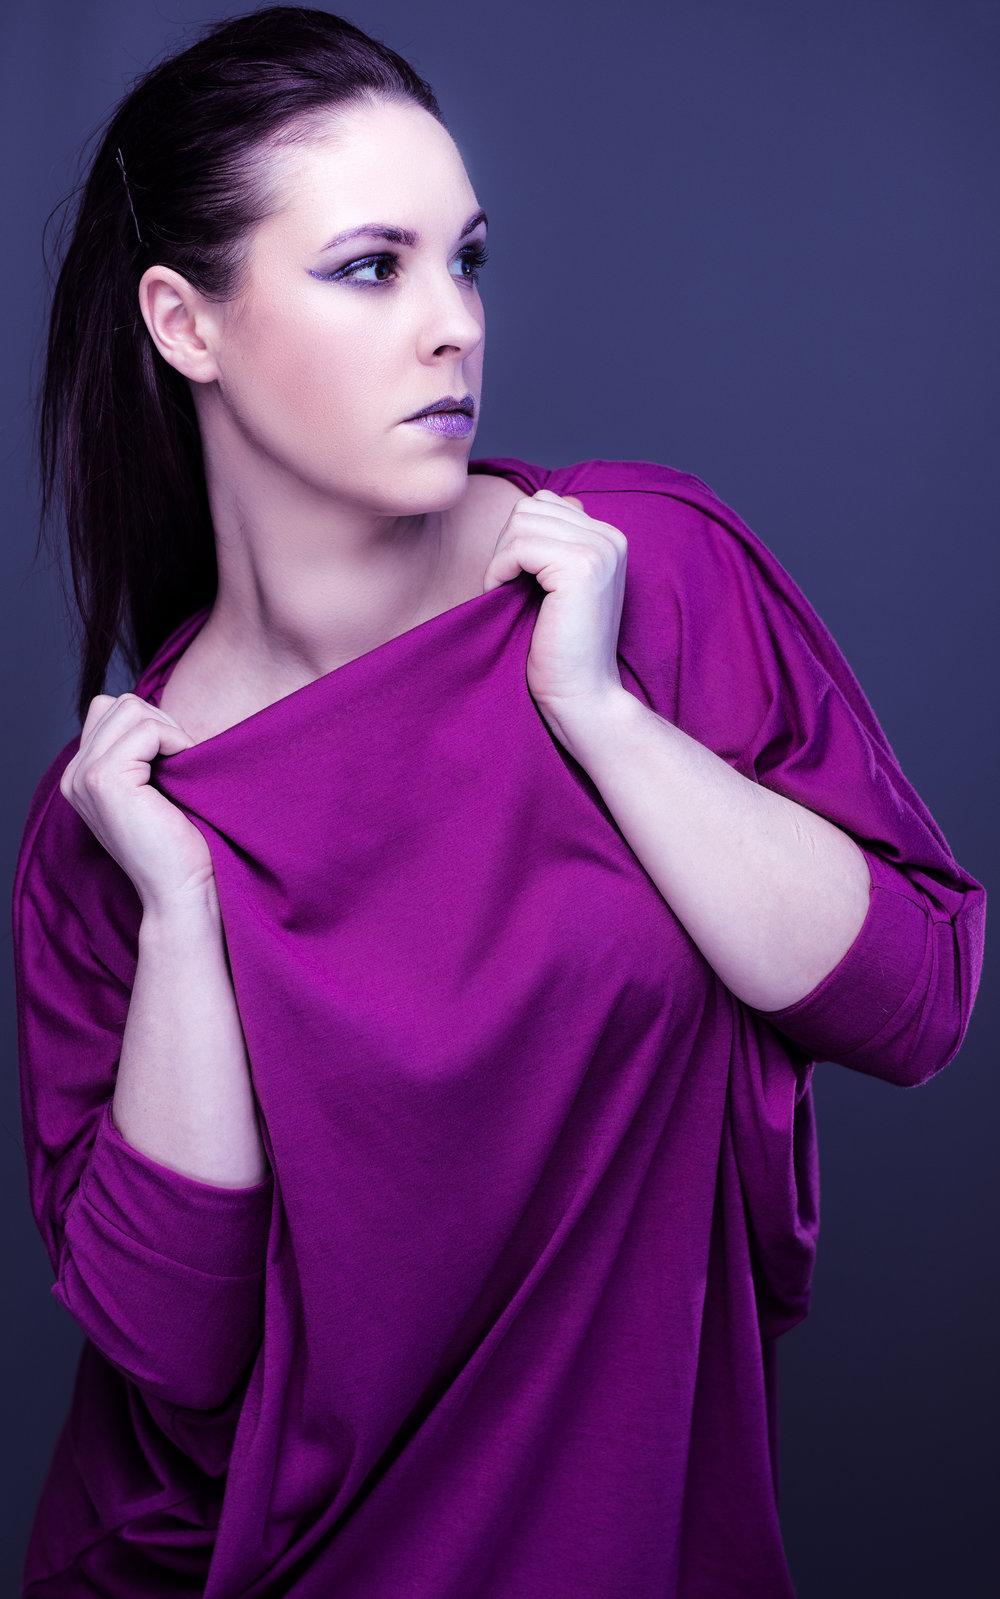 zaramia-ava-zaramiaava-leeds-fashion-designer-ethical-sustainable-minimalist-ayaka-magenta-dress-versatile-drape-cowl-styling-studio-womenswear-models-photoshoot-vibrant-colour-5